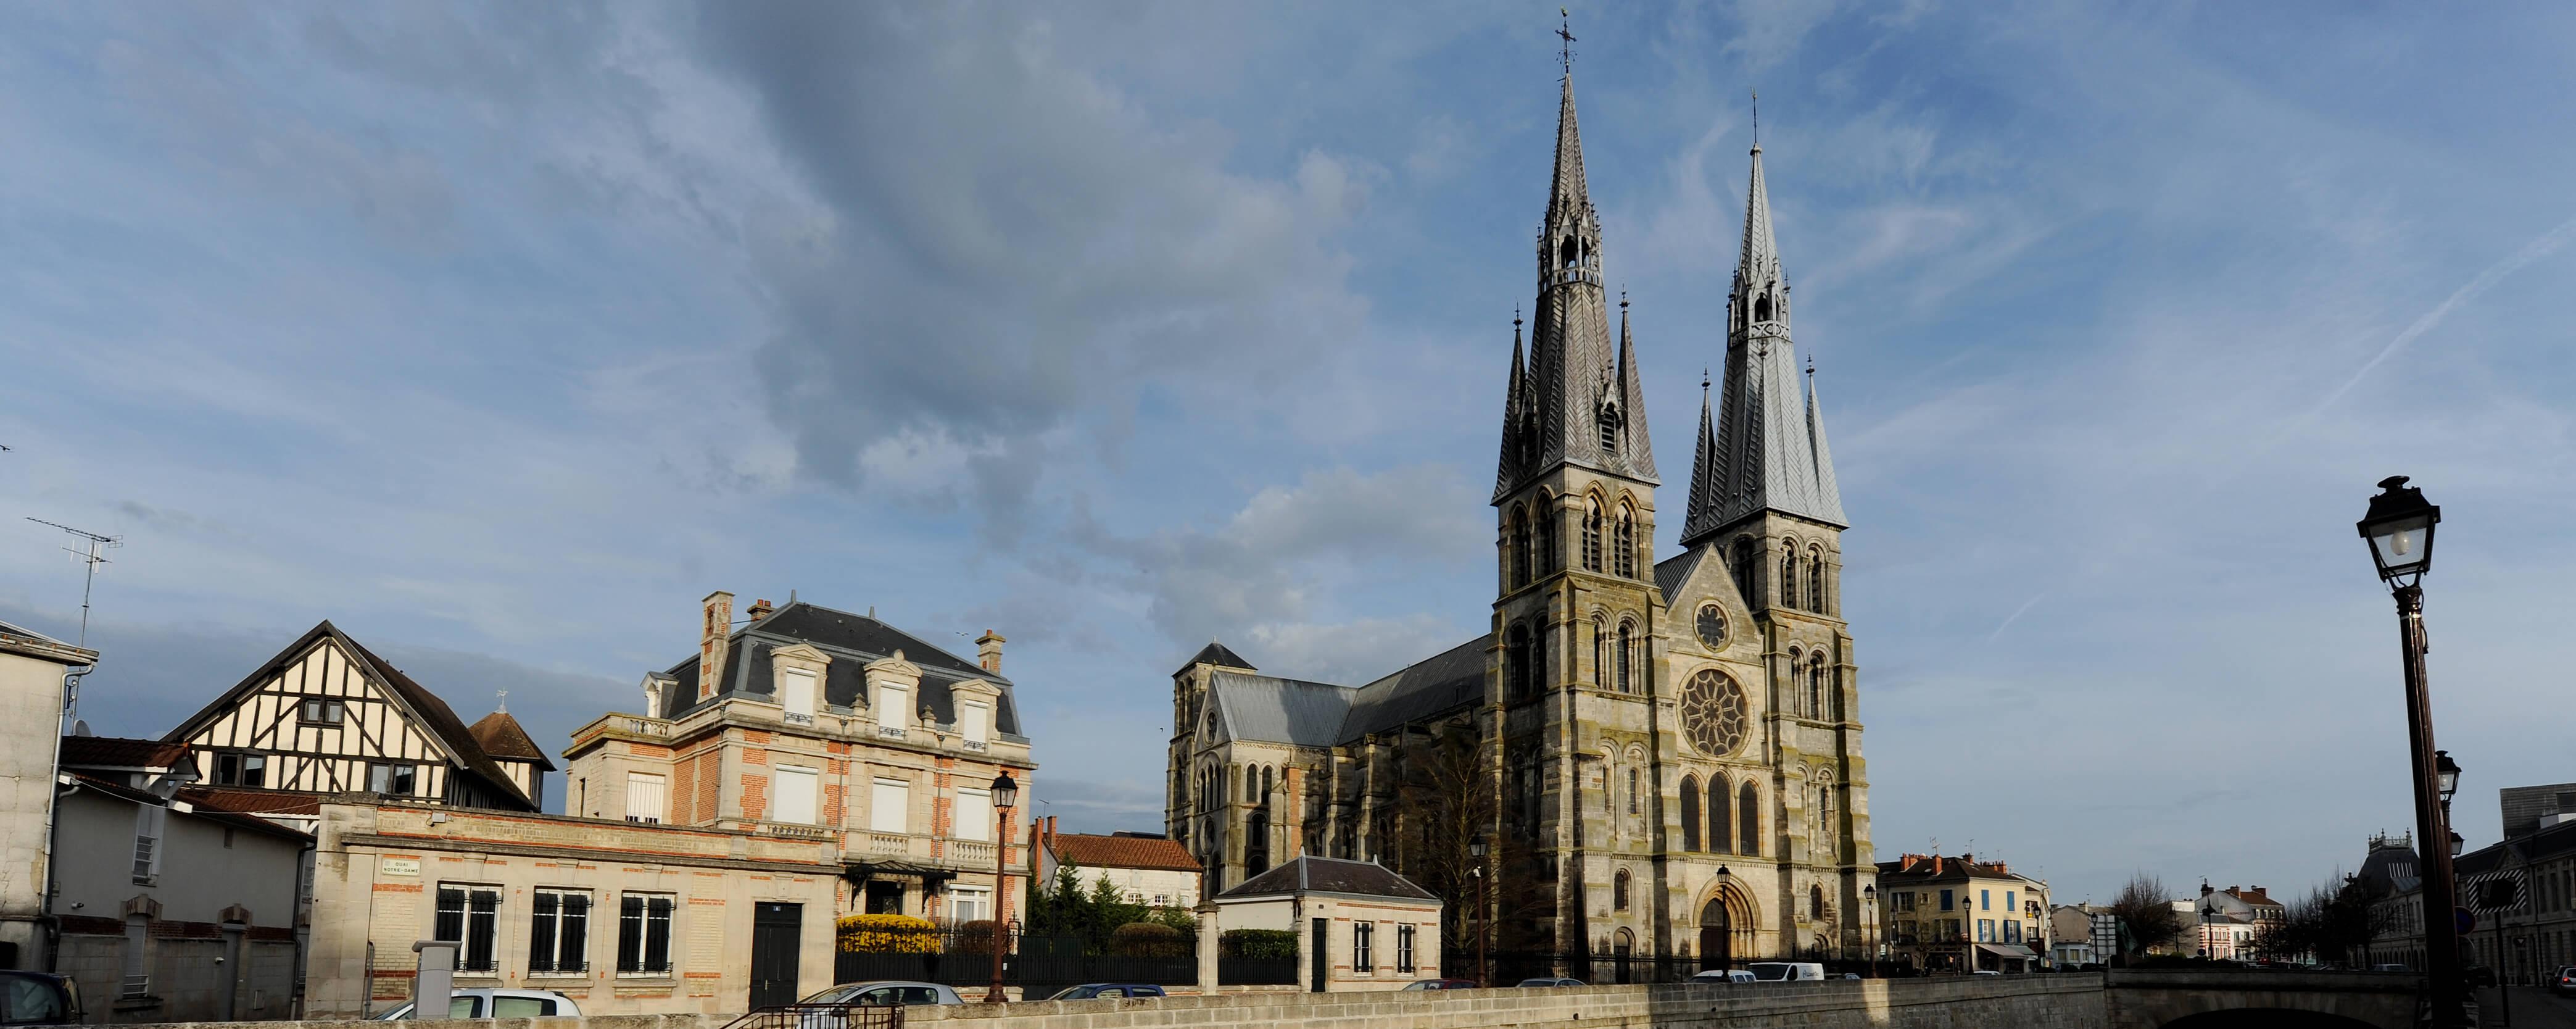 Eglise Notre-Dame-en-Vaux©ACIR / JJ Gelbart